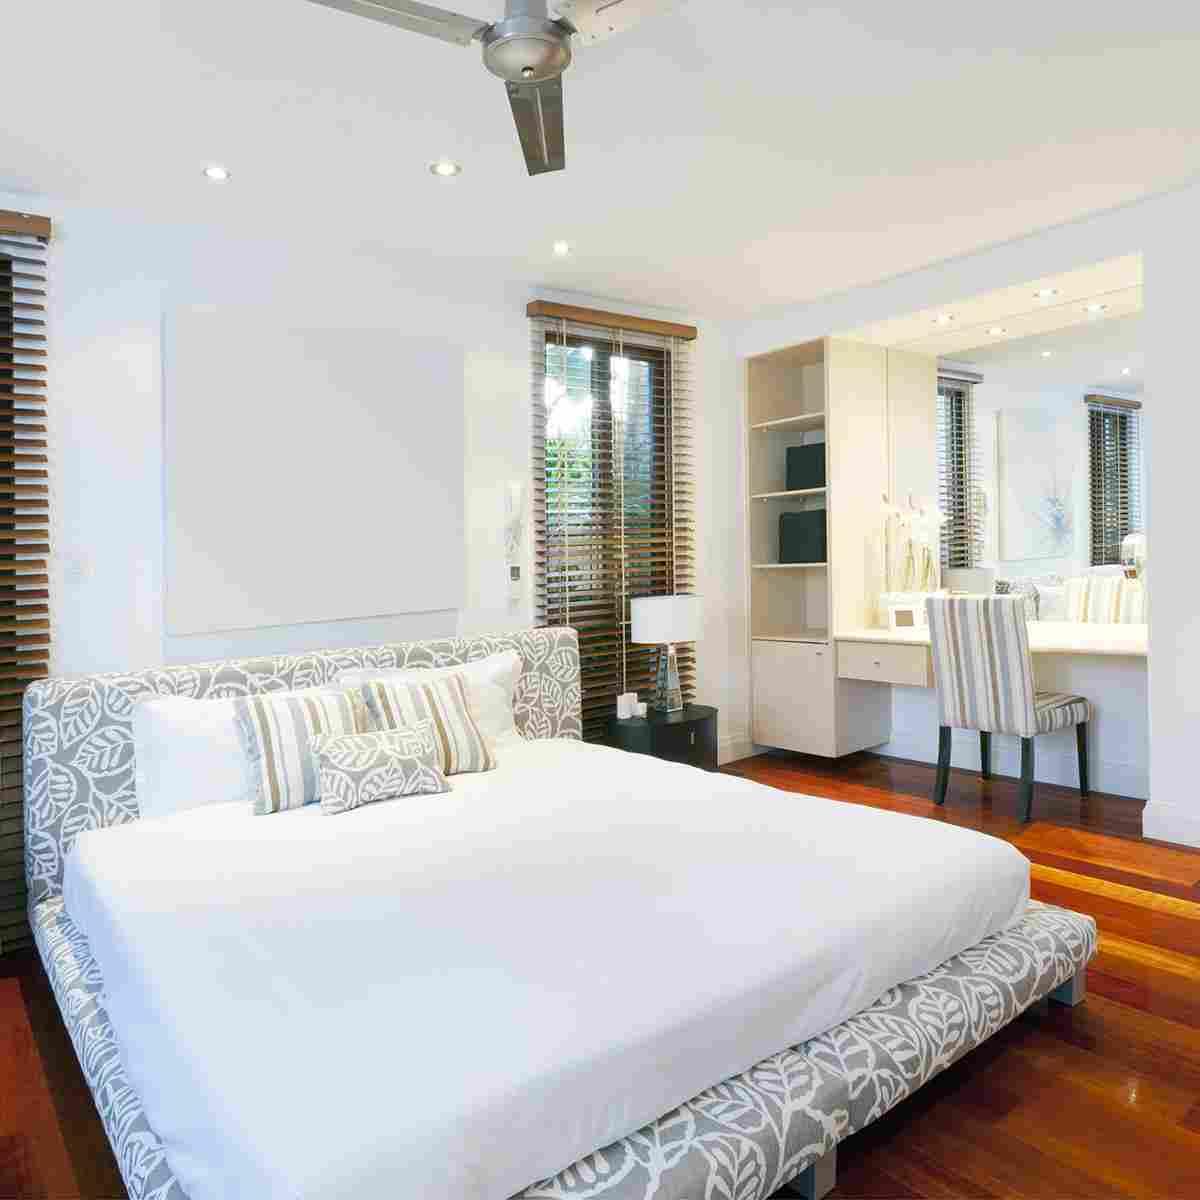 https://www.tamarind6.com/wp-content/uploads/2016/05/details-bedroom-2.jpg